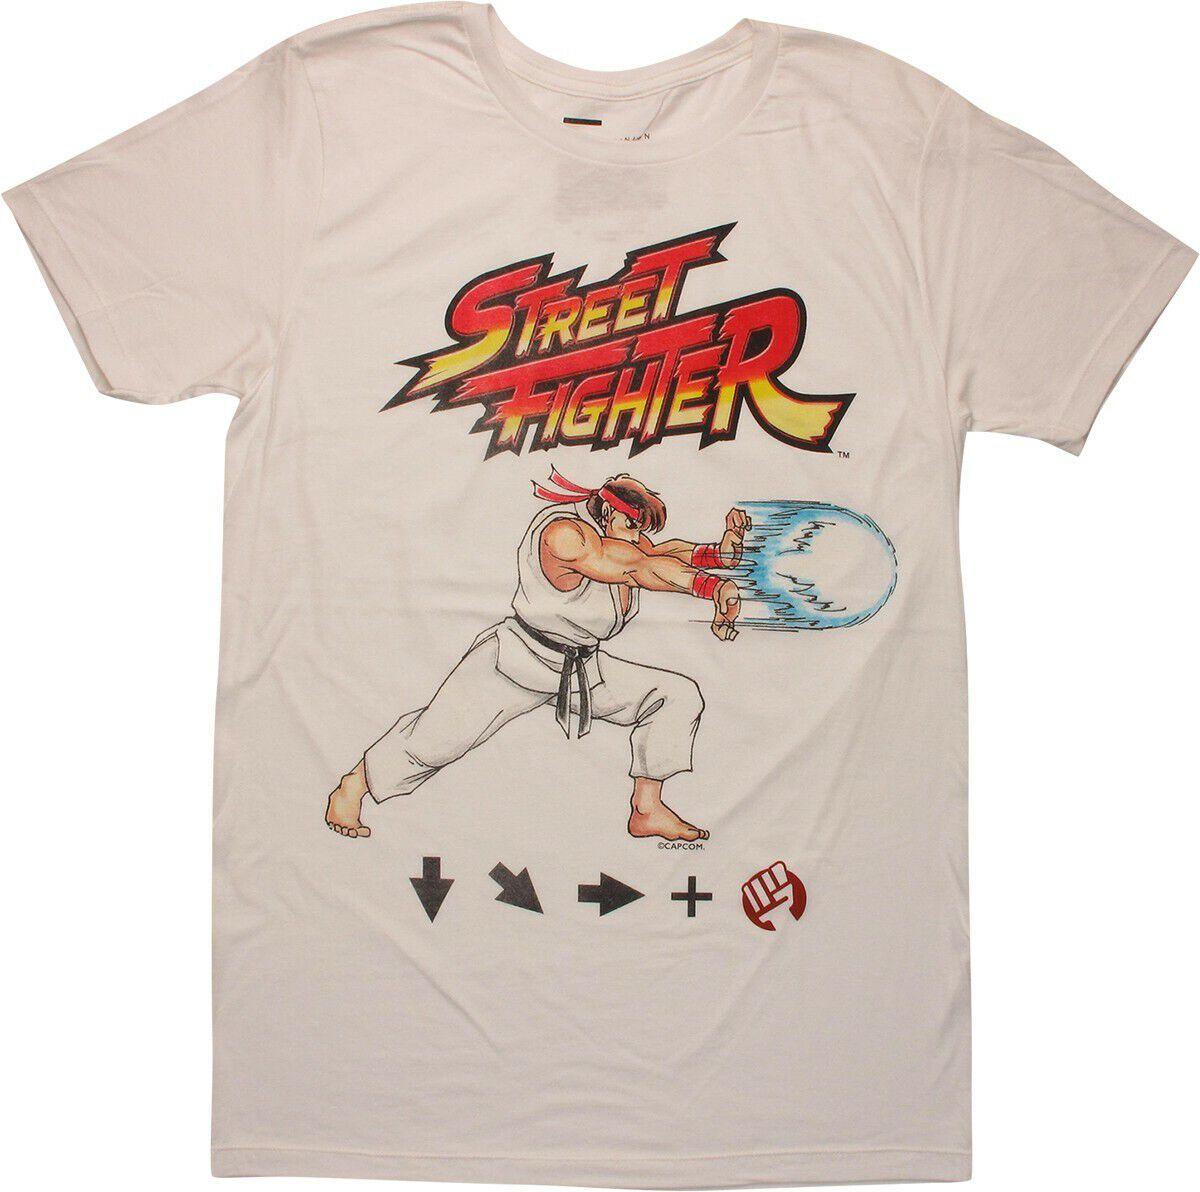 Street Fighter Ryu Hadouken Control White T-Shirt